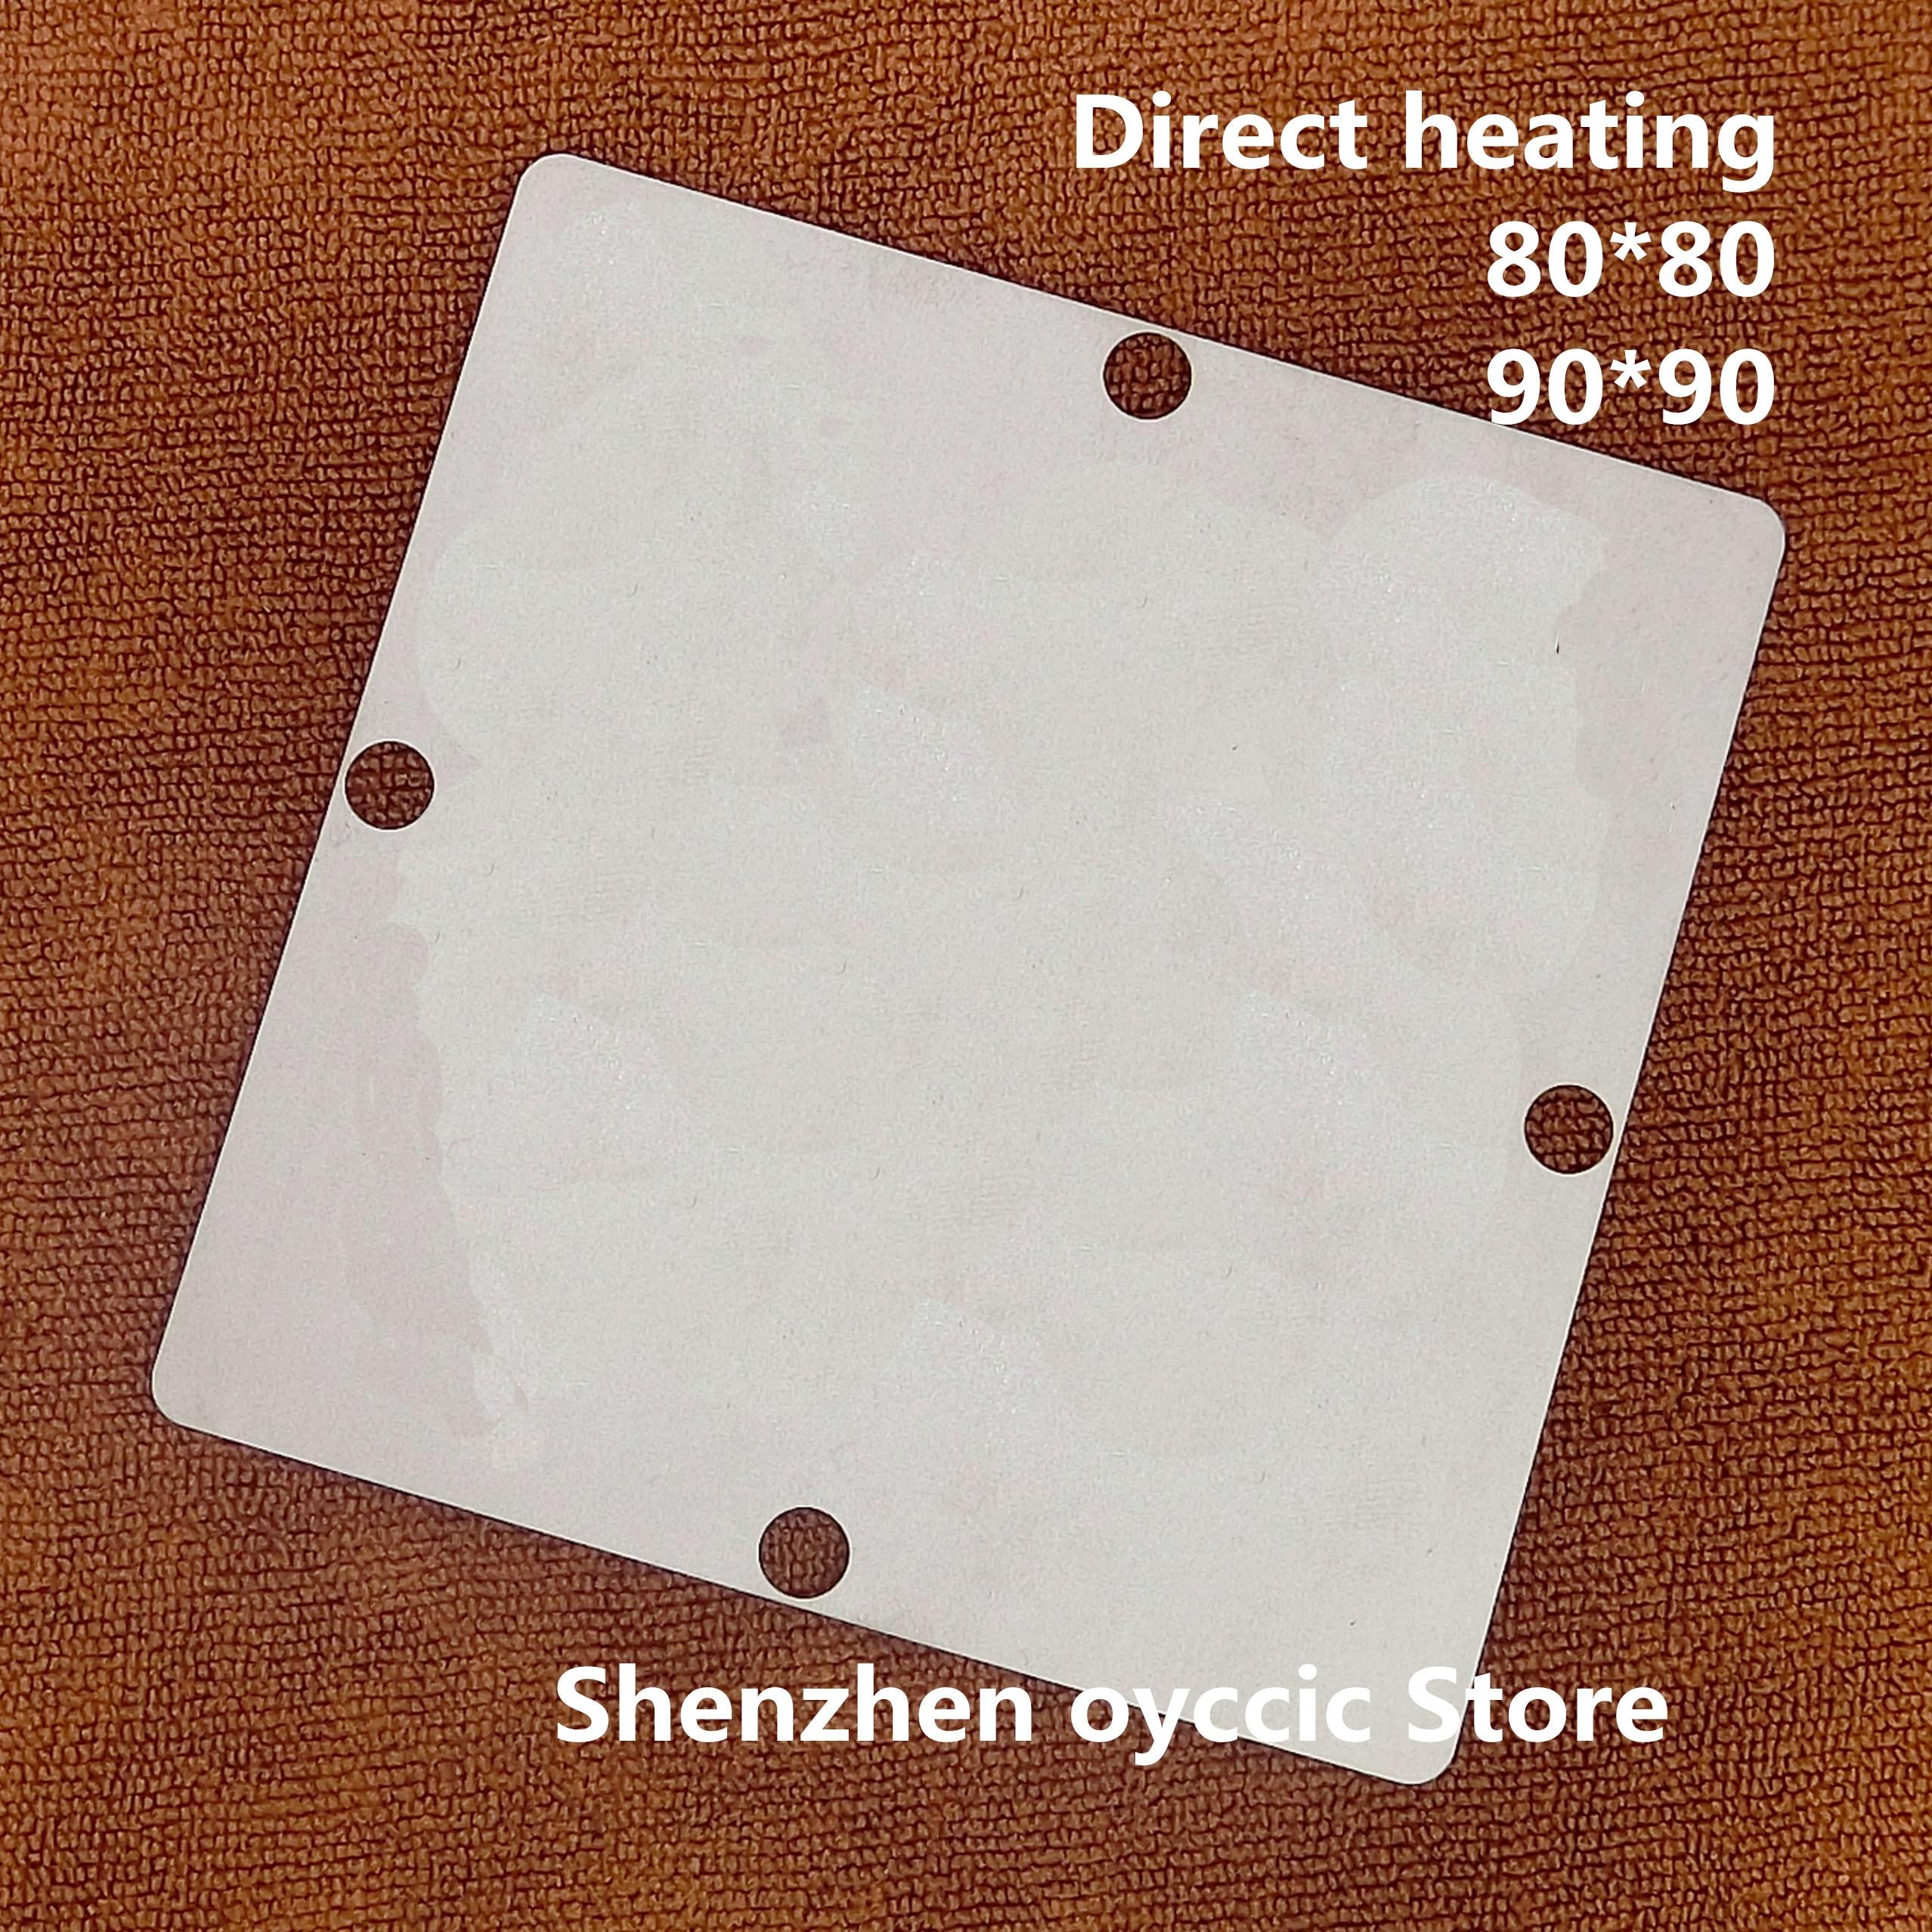 Direct Heating 80*80 90*90  BCM53125SKMMLG  BCM53125 SKMMLG  QFN Stencil Template  Plant Tin Station Tin Tools